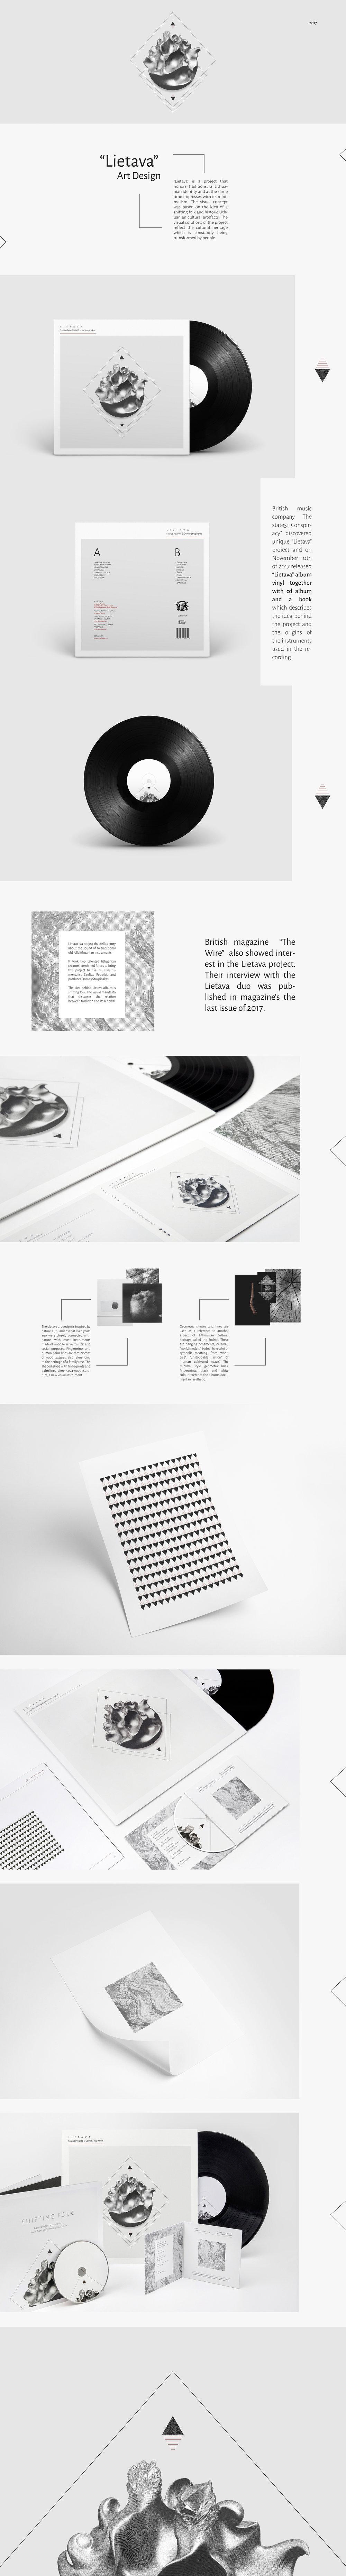 LIETAVA project.jpg